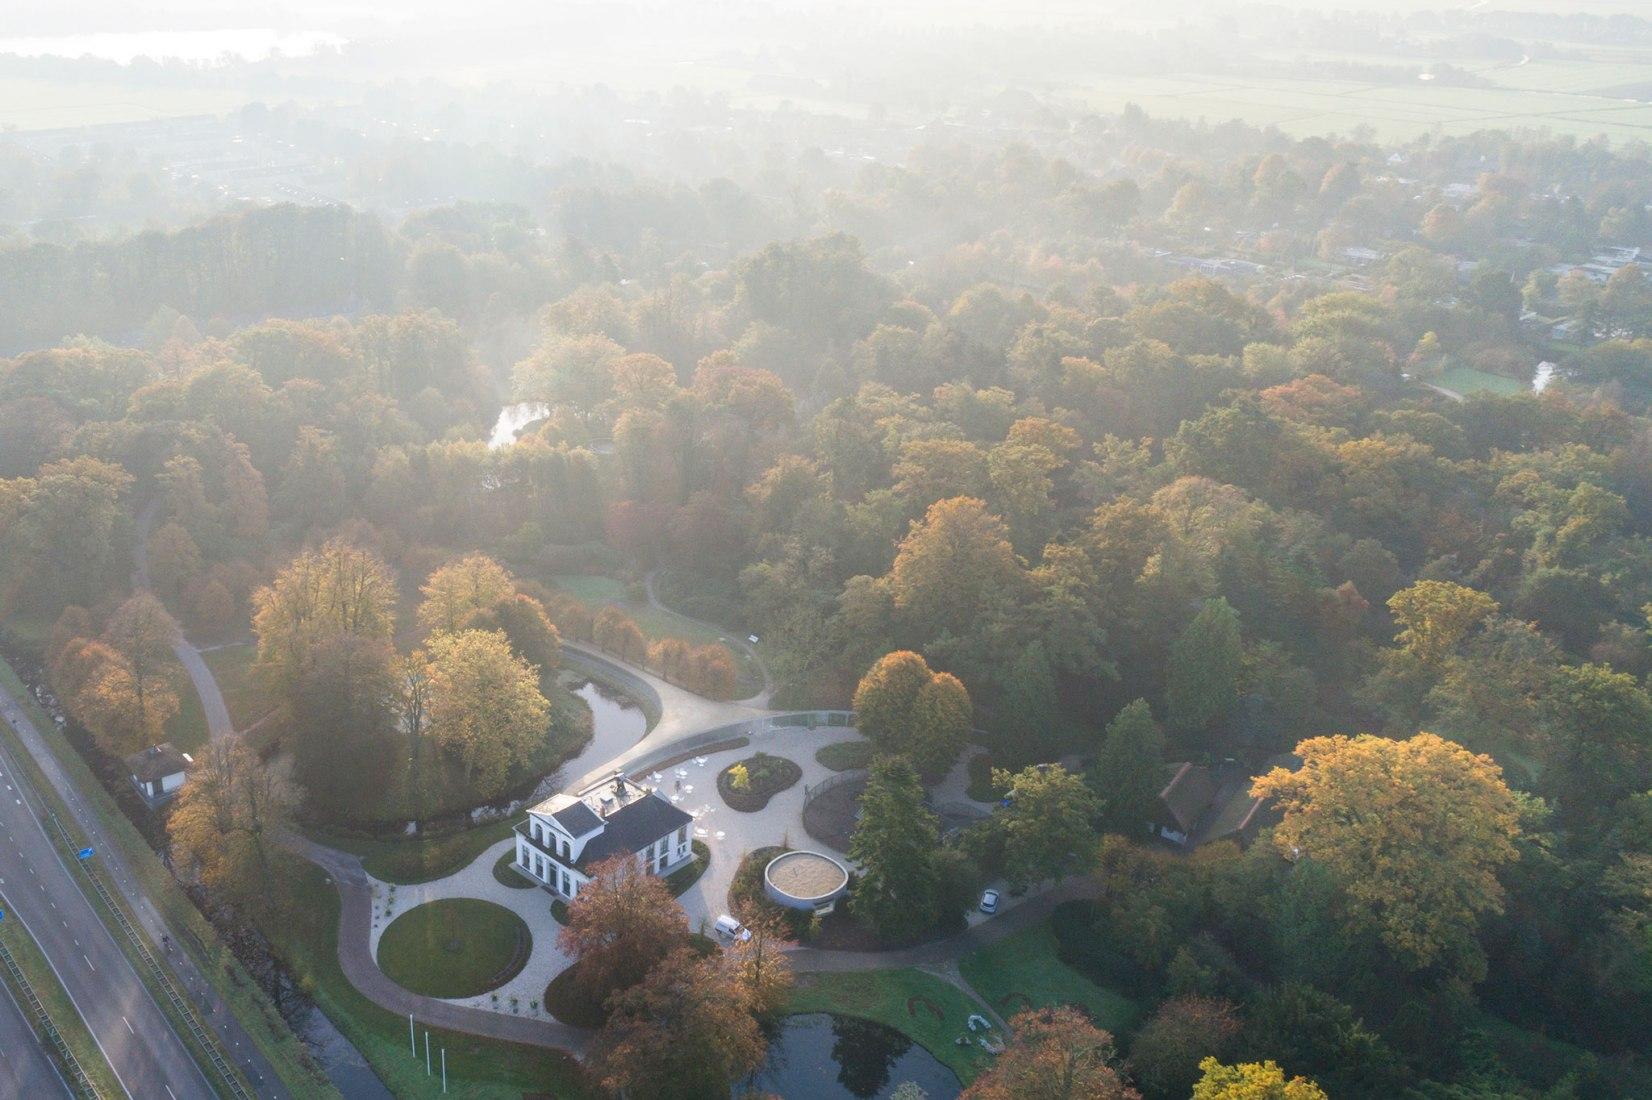 Overview pavilion. Park Groot Vijversburg by STUDIO MAKS / Marieke Kums & Junya Ishigami + Ass. Photograph © Iwan Baan